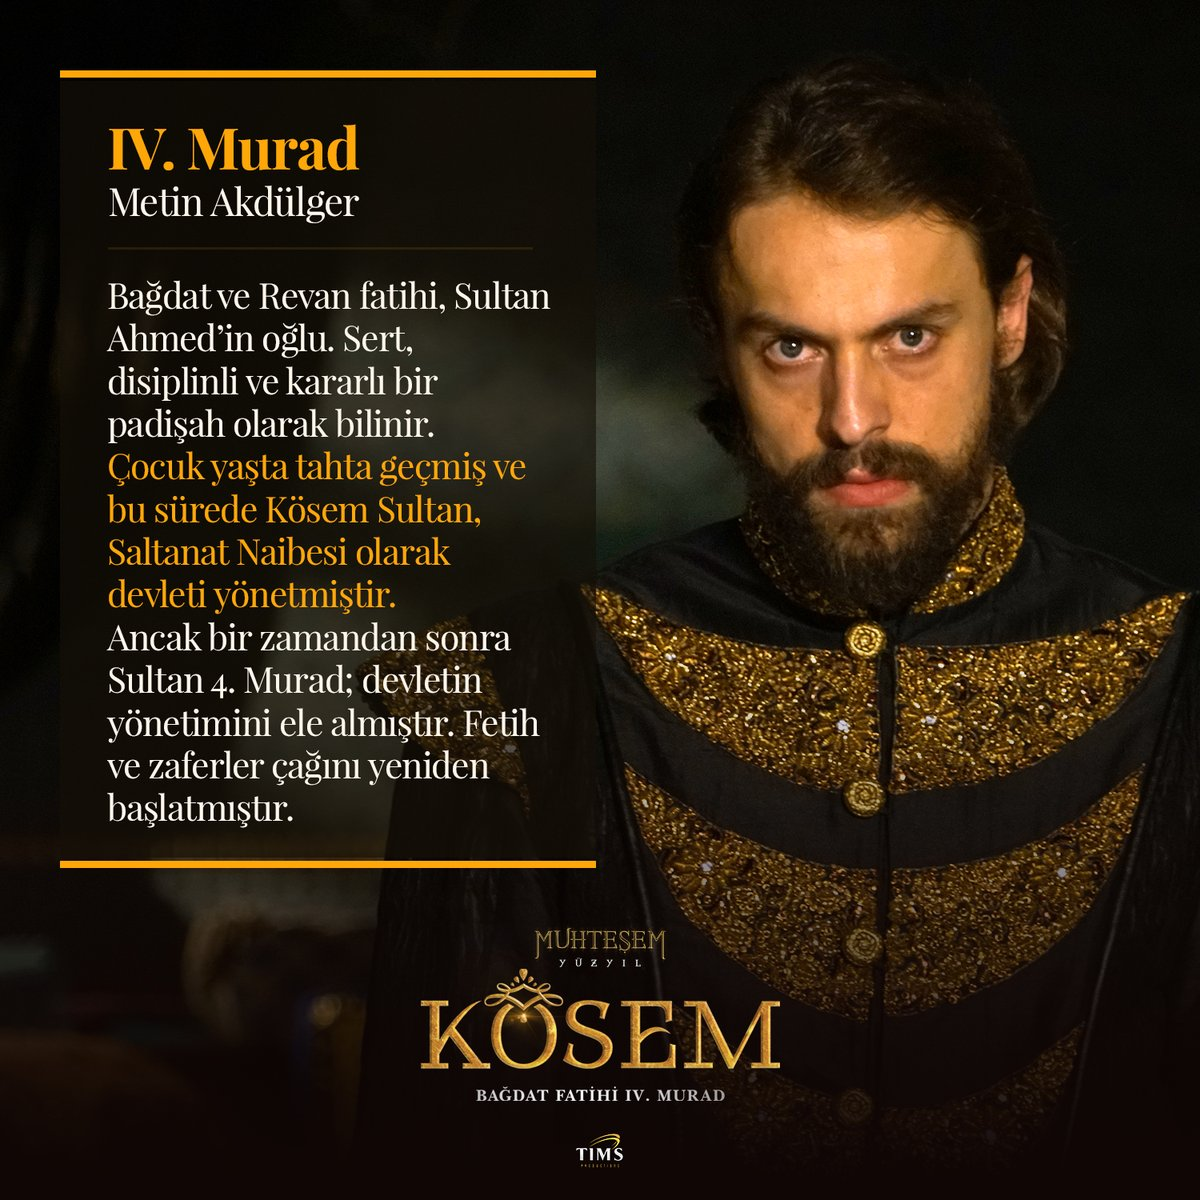 Великолепный век. Кесем - 2 сезон - Muhteşem Yüzyıl Kösem PROMO (Murad).jpg